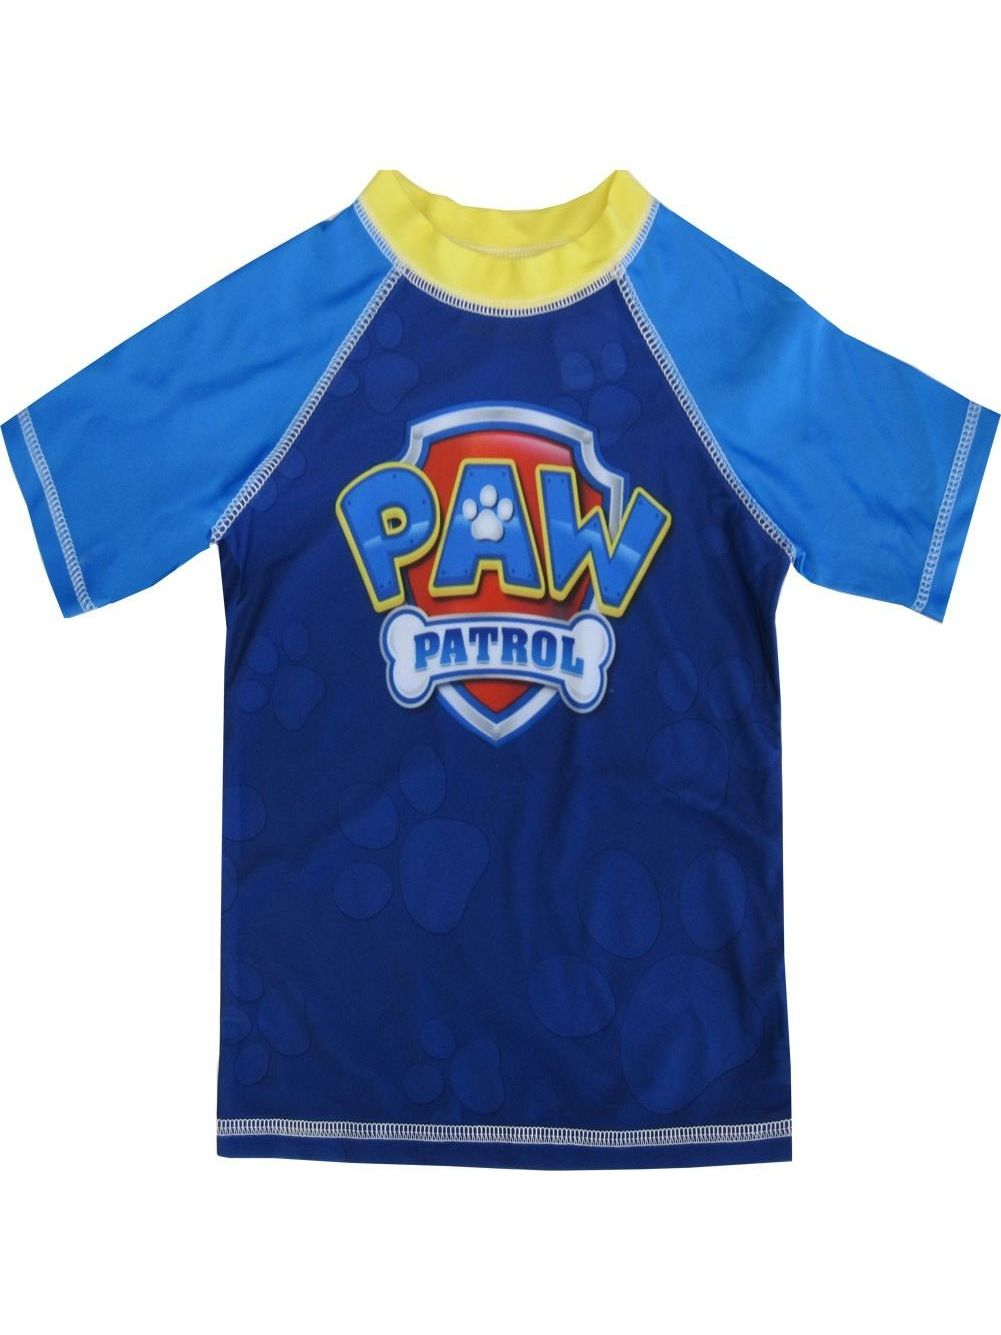 Nickelodeon Little Boys Royal Blue Paw Patrol Rash Guard Swimwear Shirt 2-4T